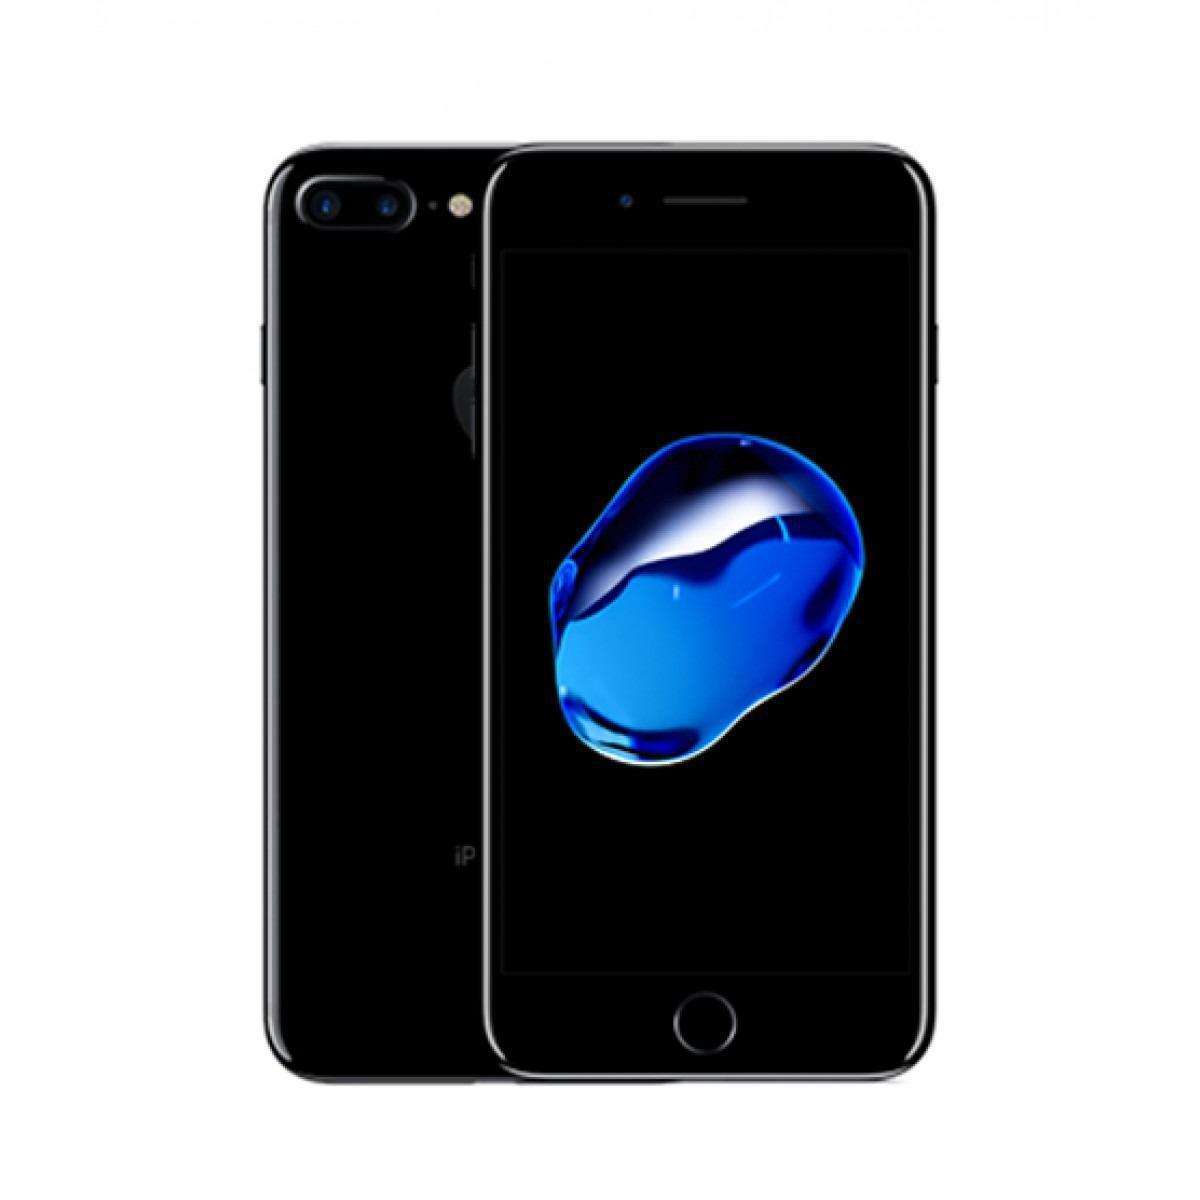 Iphone x 256 gb ohne vertrag